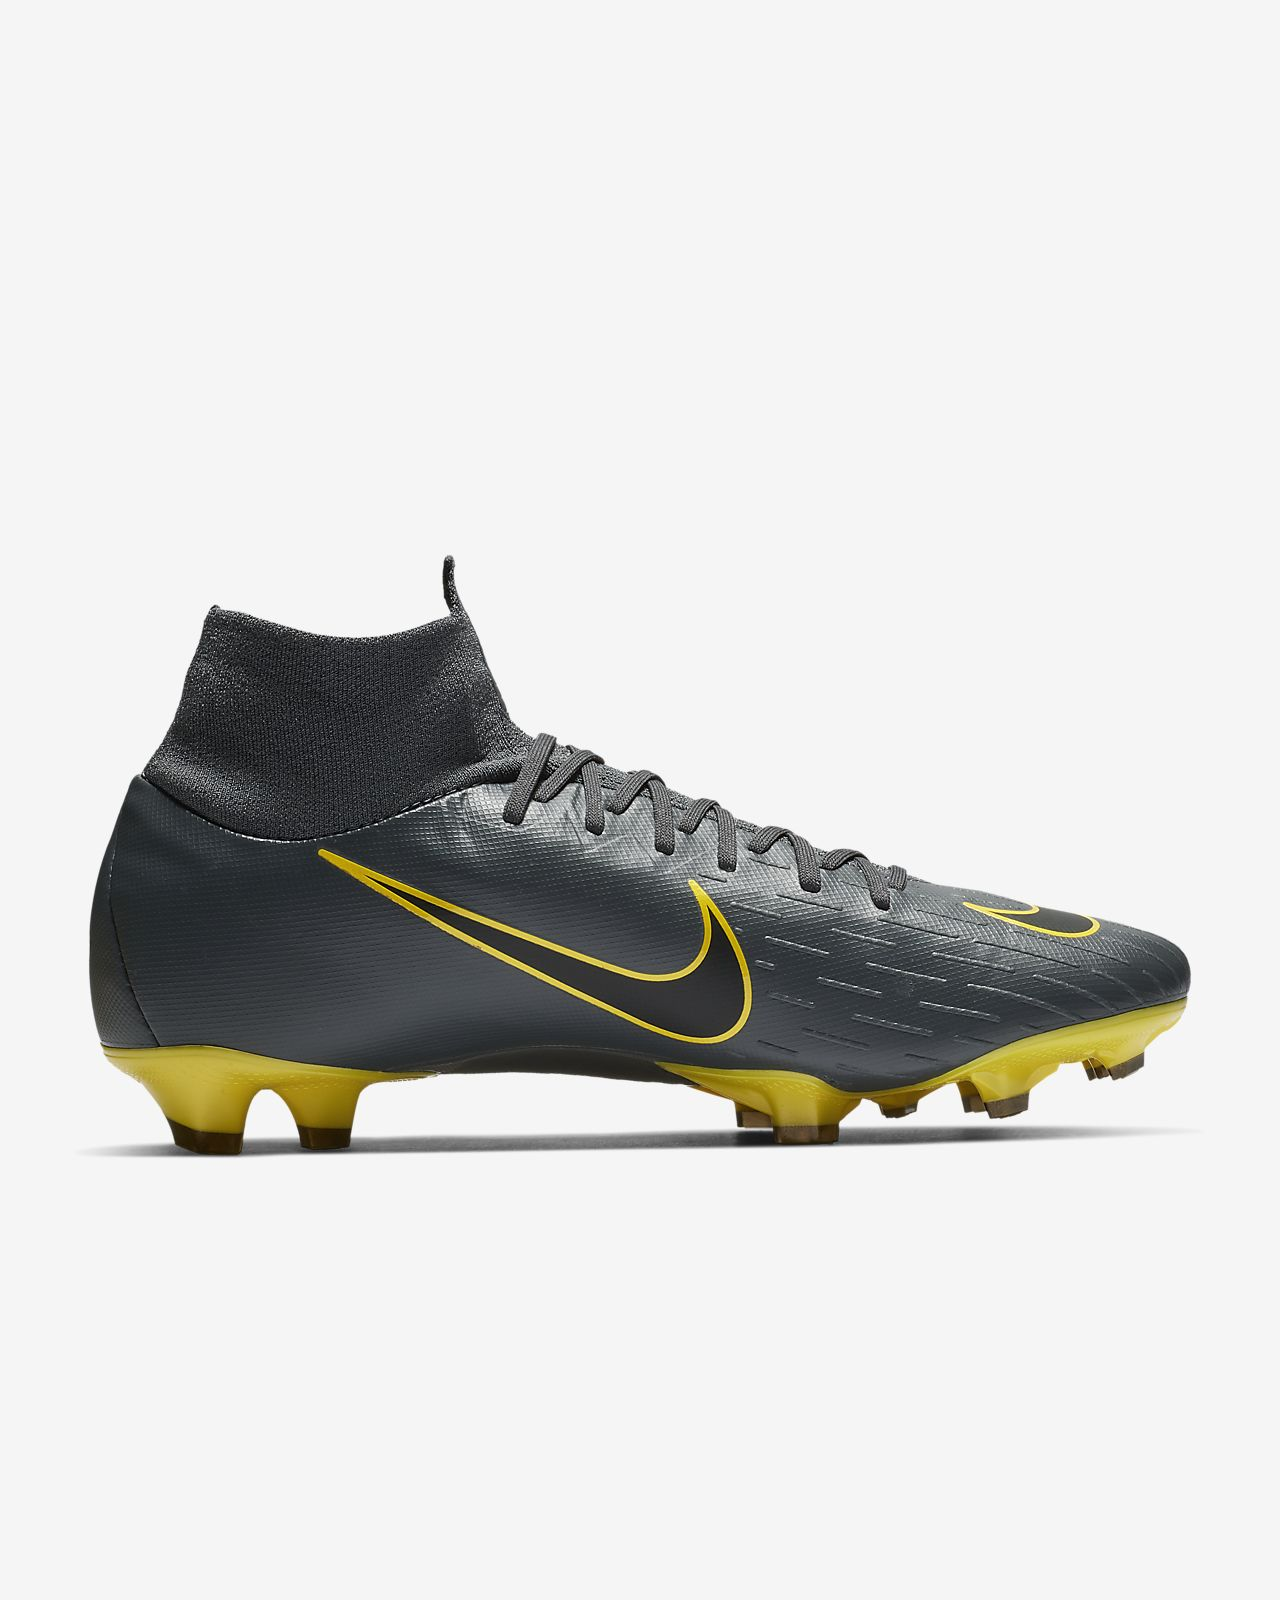 15c12fabddb2 Nike Superfly 6 Pro FG Firm-Ground Football Boot. Nike.com GB